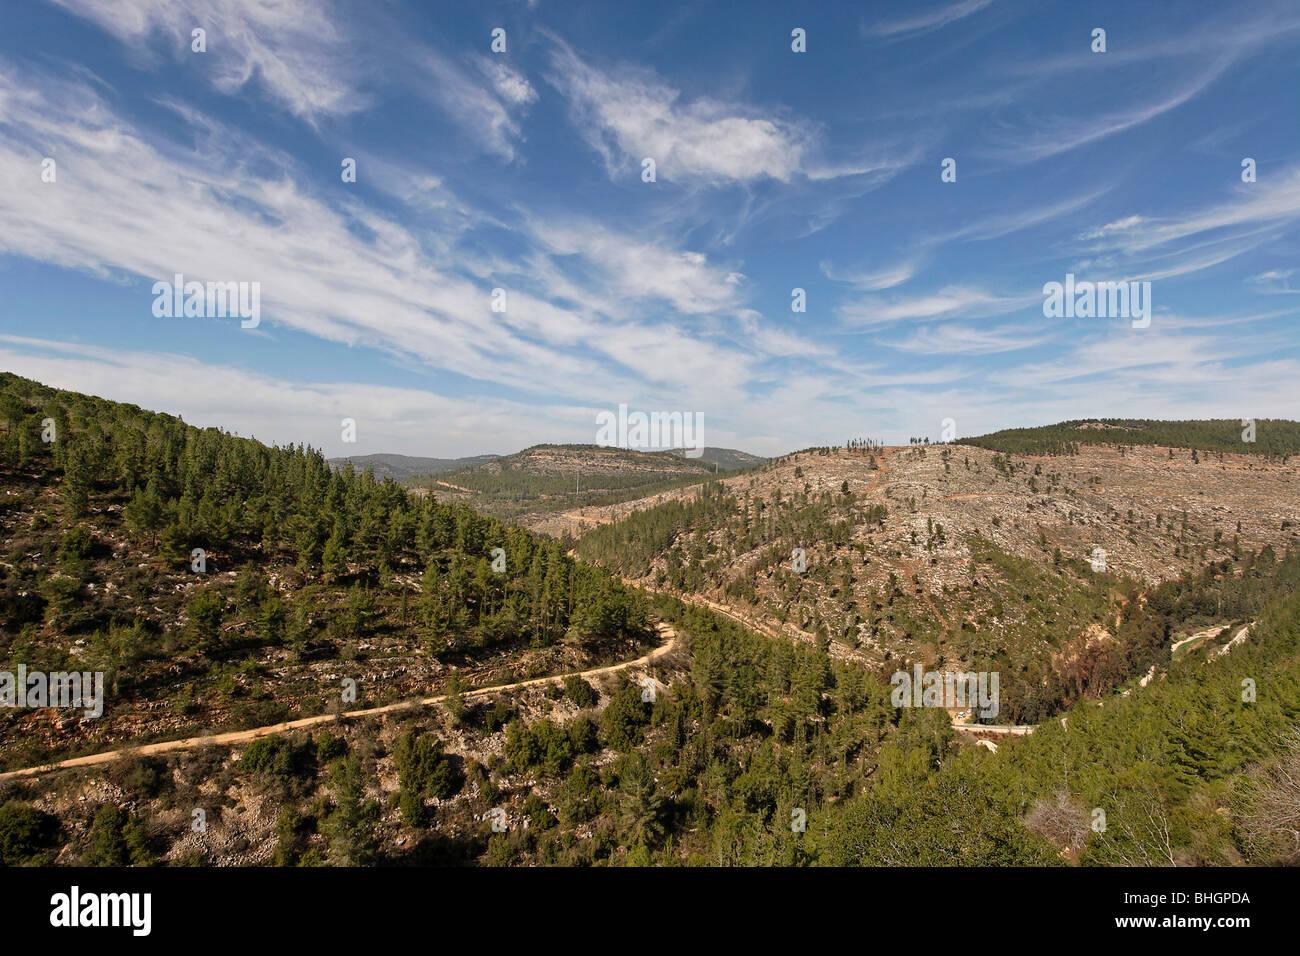 Israel, Jerusalem Mountains. Scenery at Begin Park - Stock Image